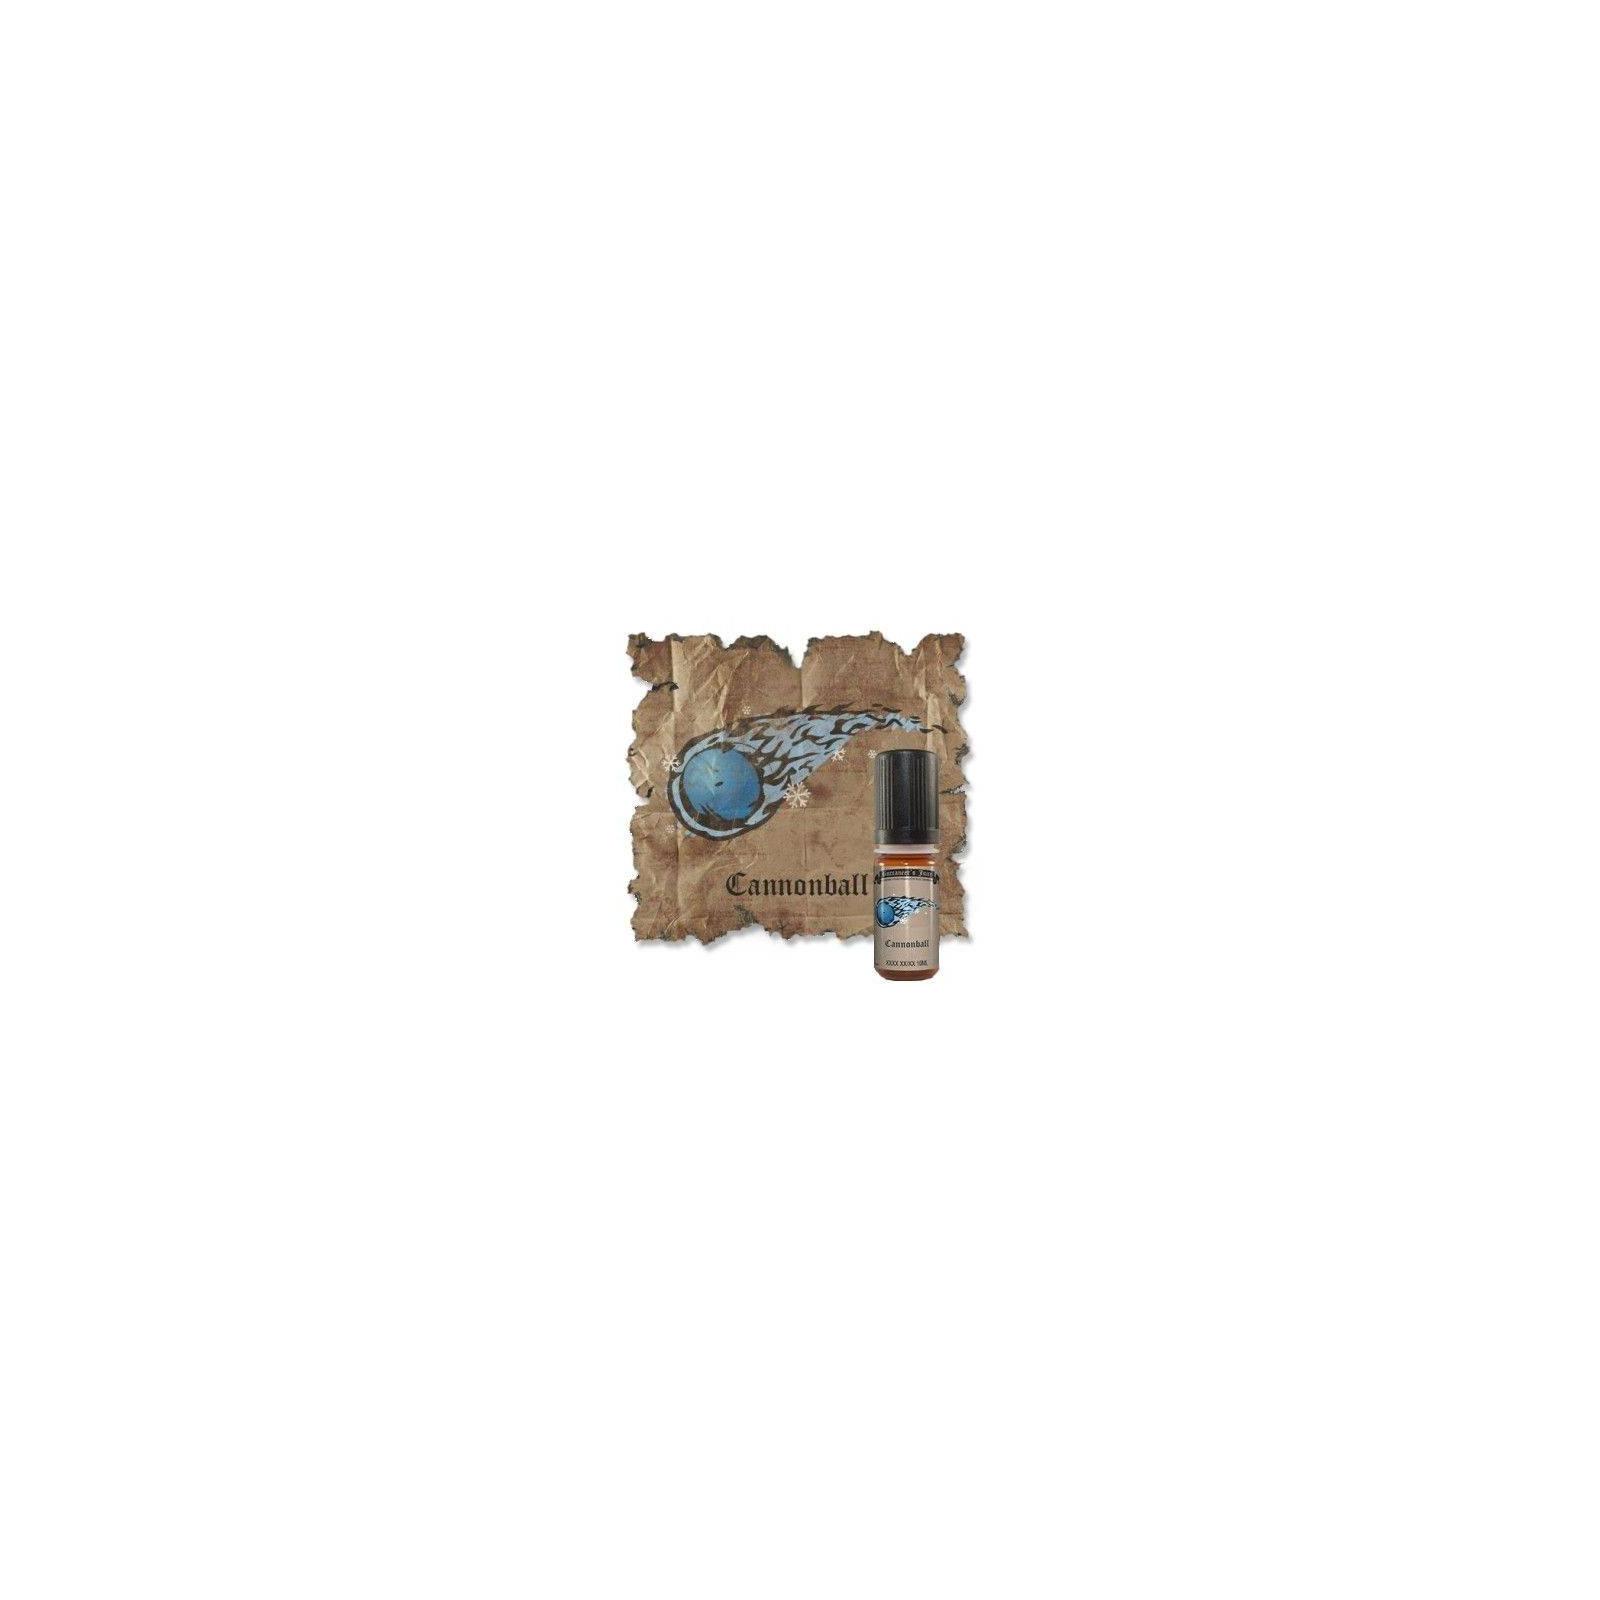 Cannonball - BUCCANEER'S